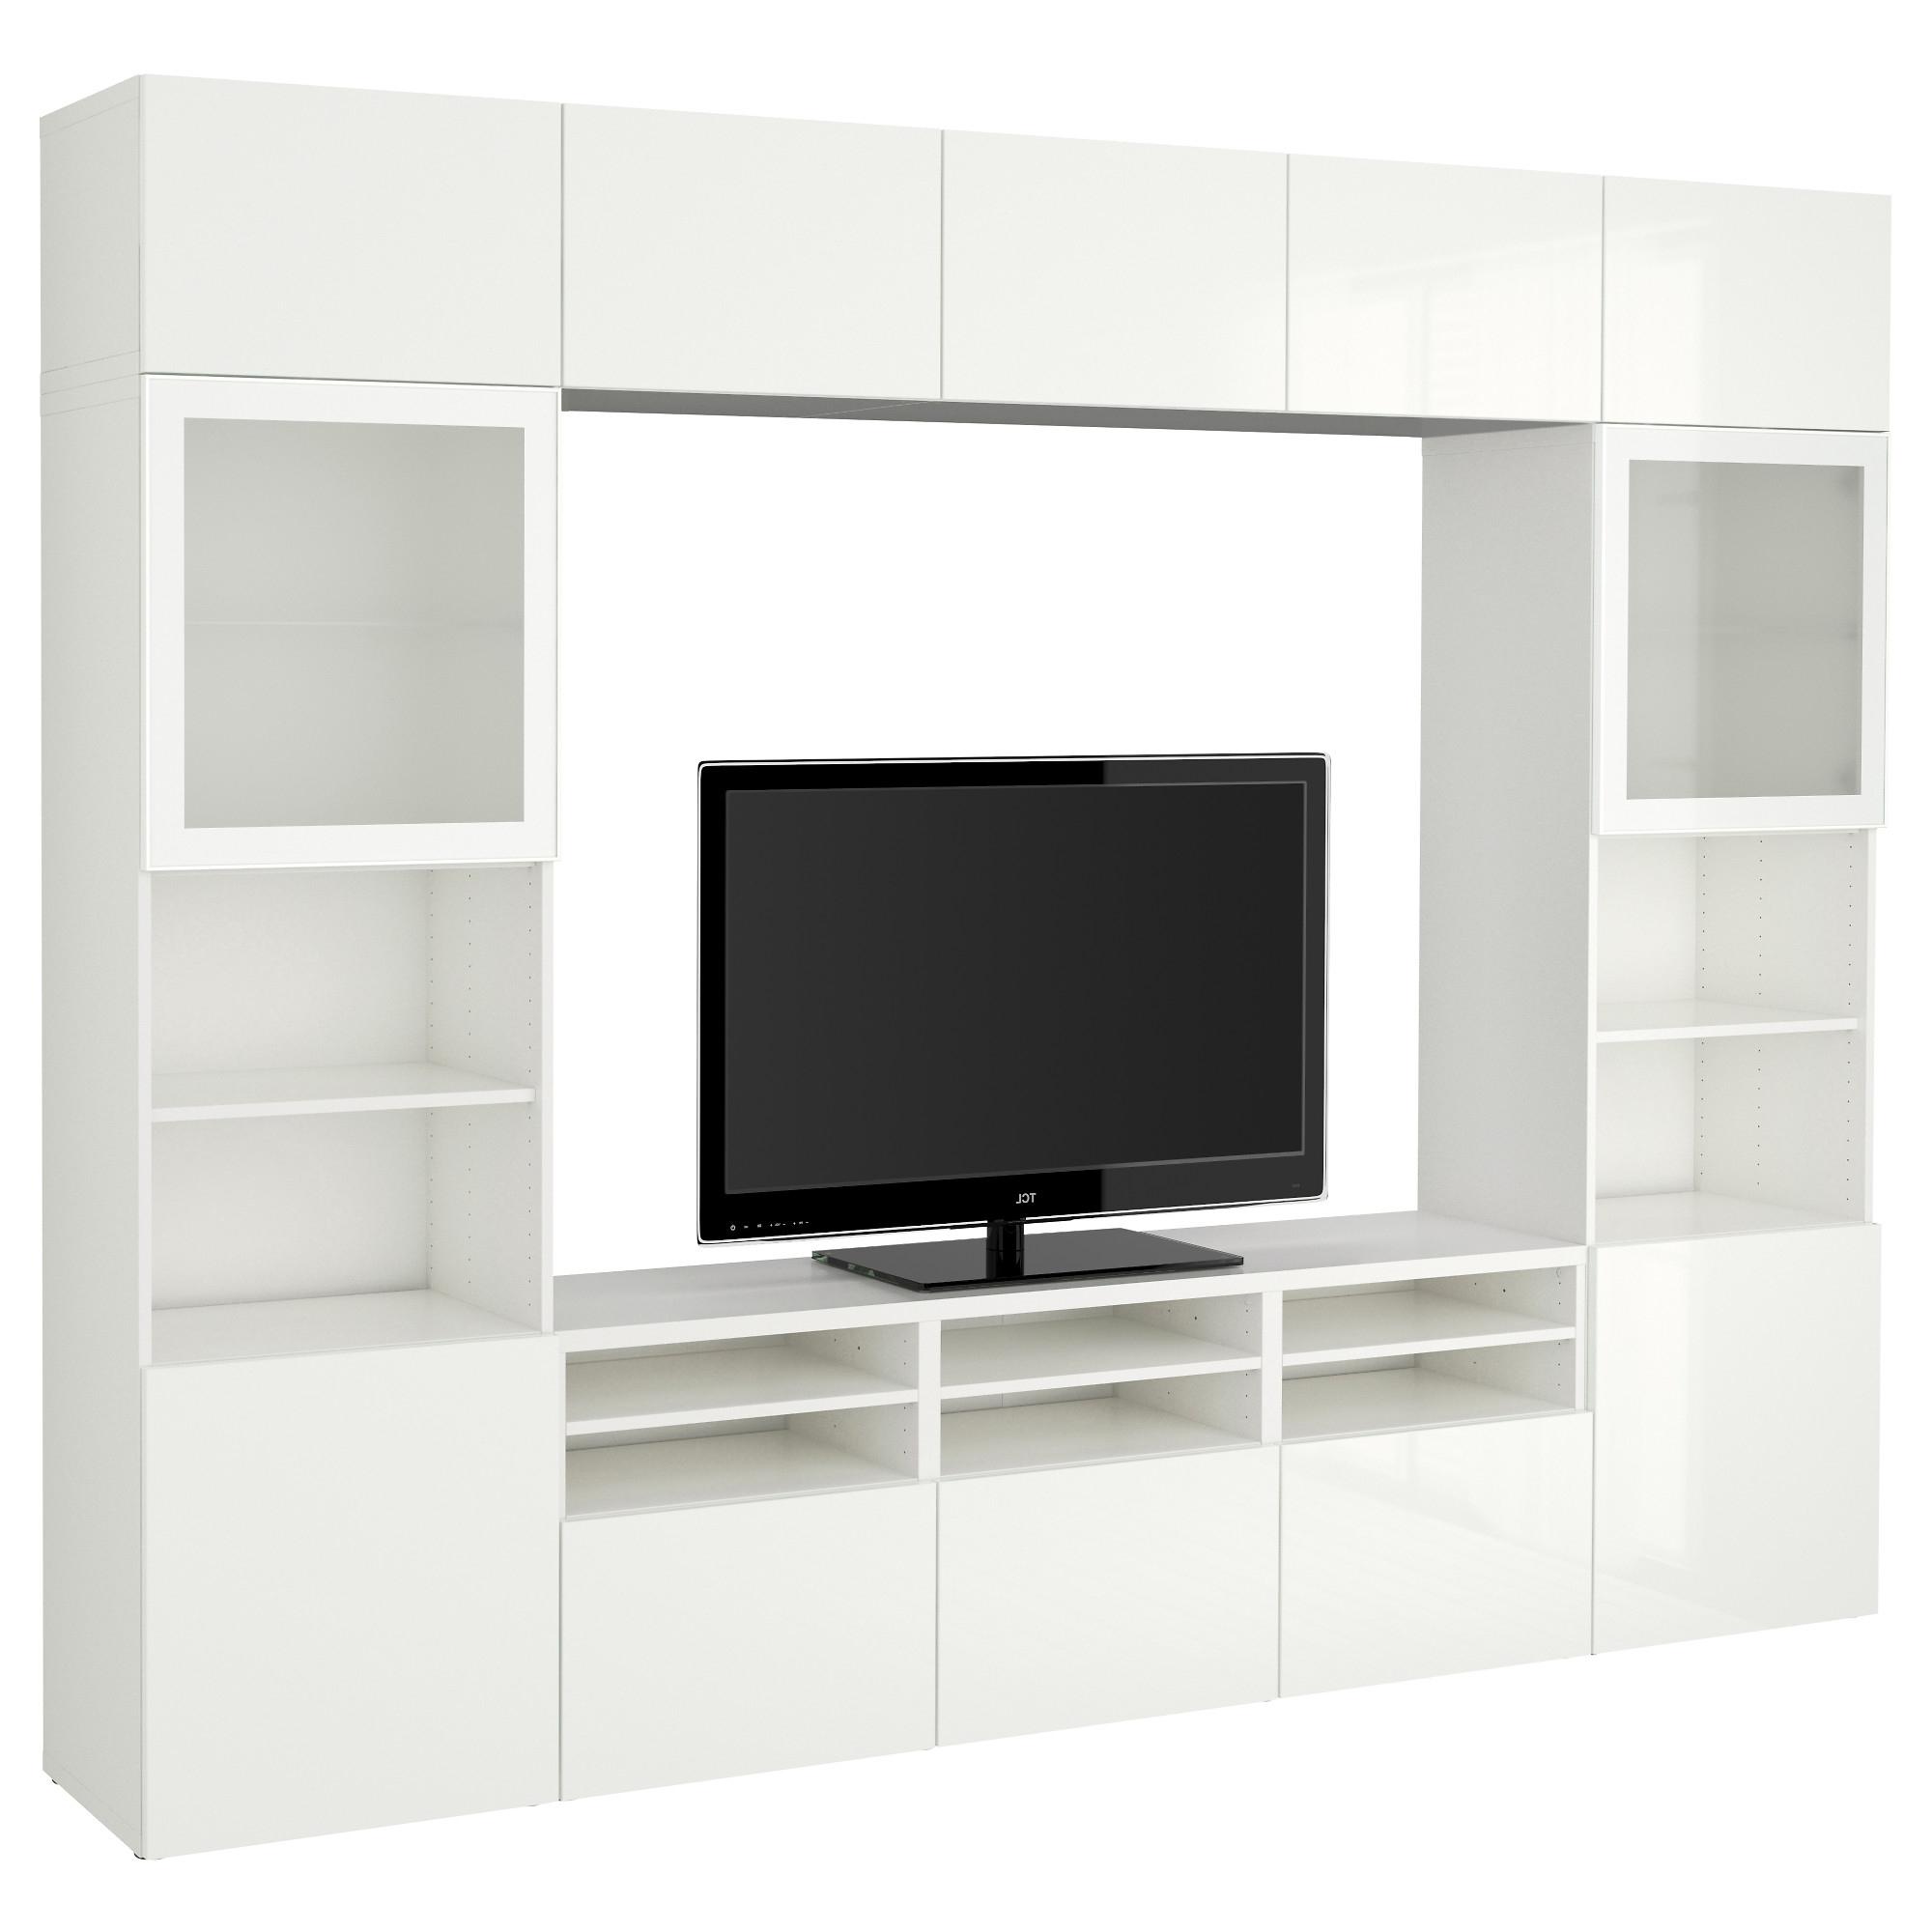 Besta Tv Storage Combinationglass Doors Whiteselsviken High Ikea Pertaining To Most Current Tv Storage Units (View 3 of 15)